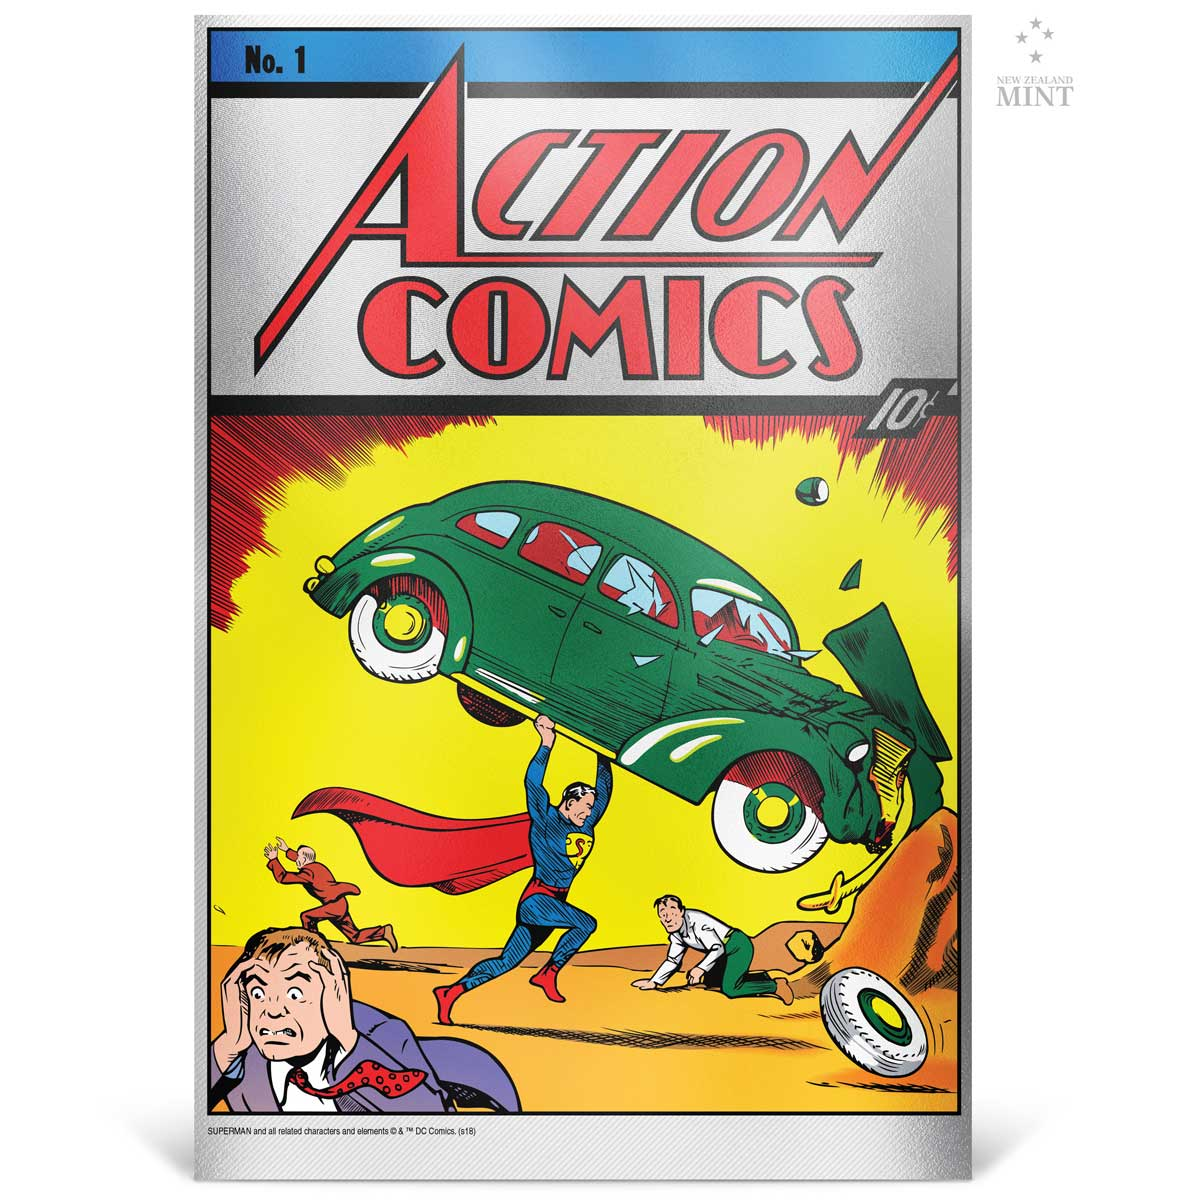 2018 DC Comics Action Comics #1 35g silver foil